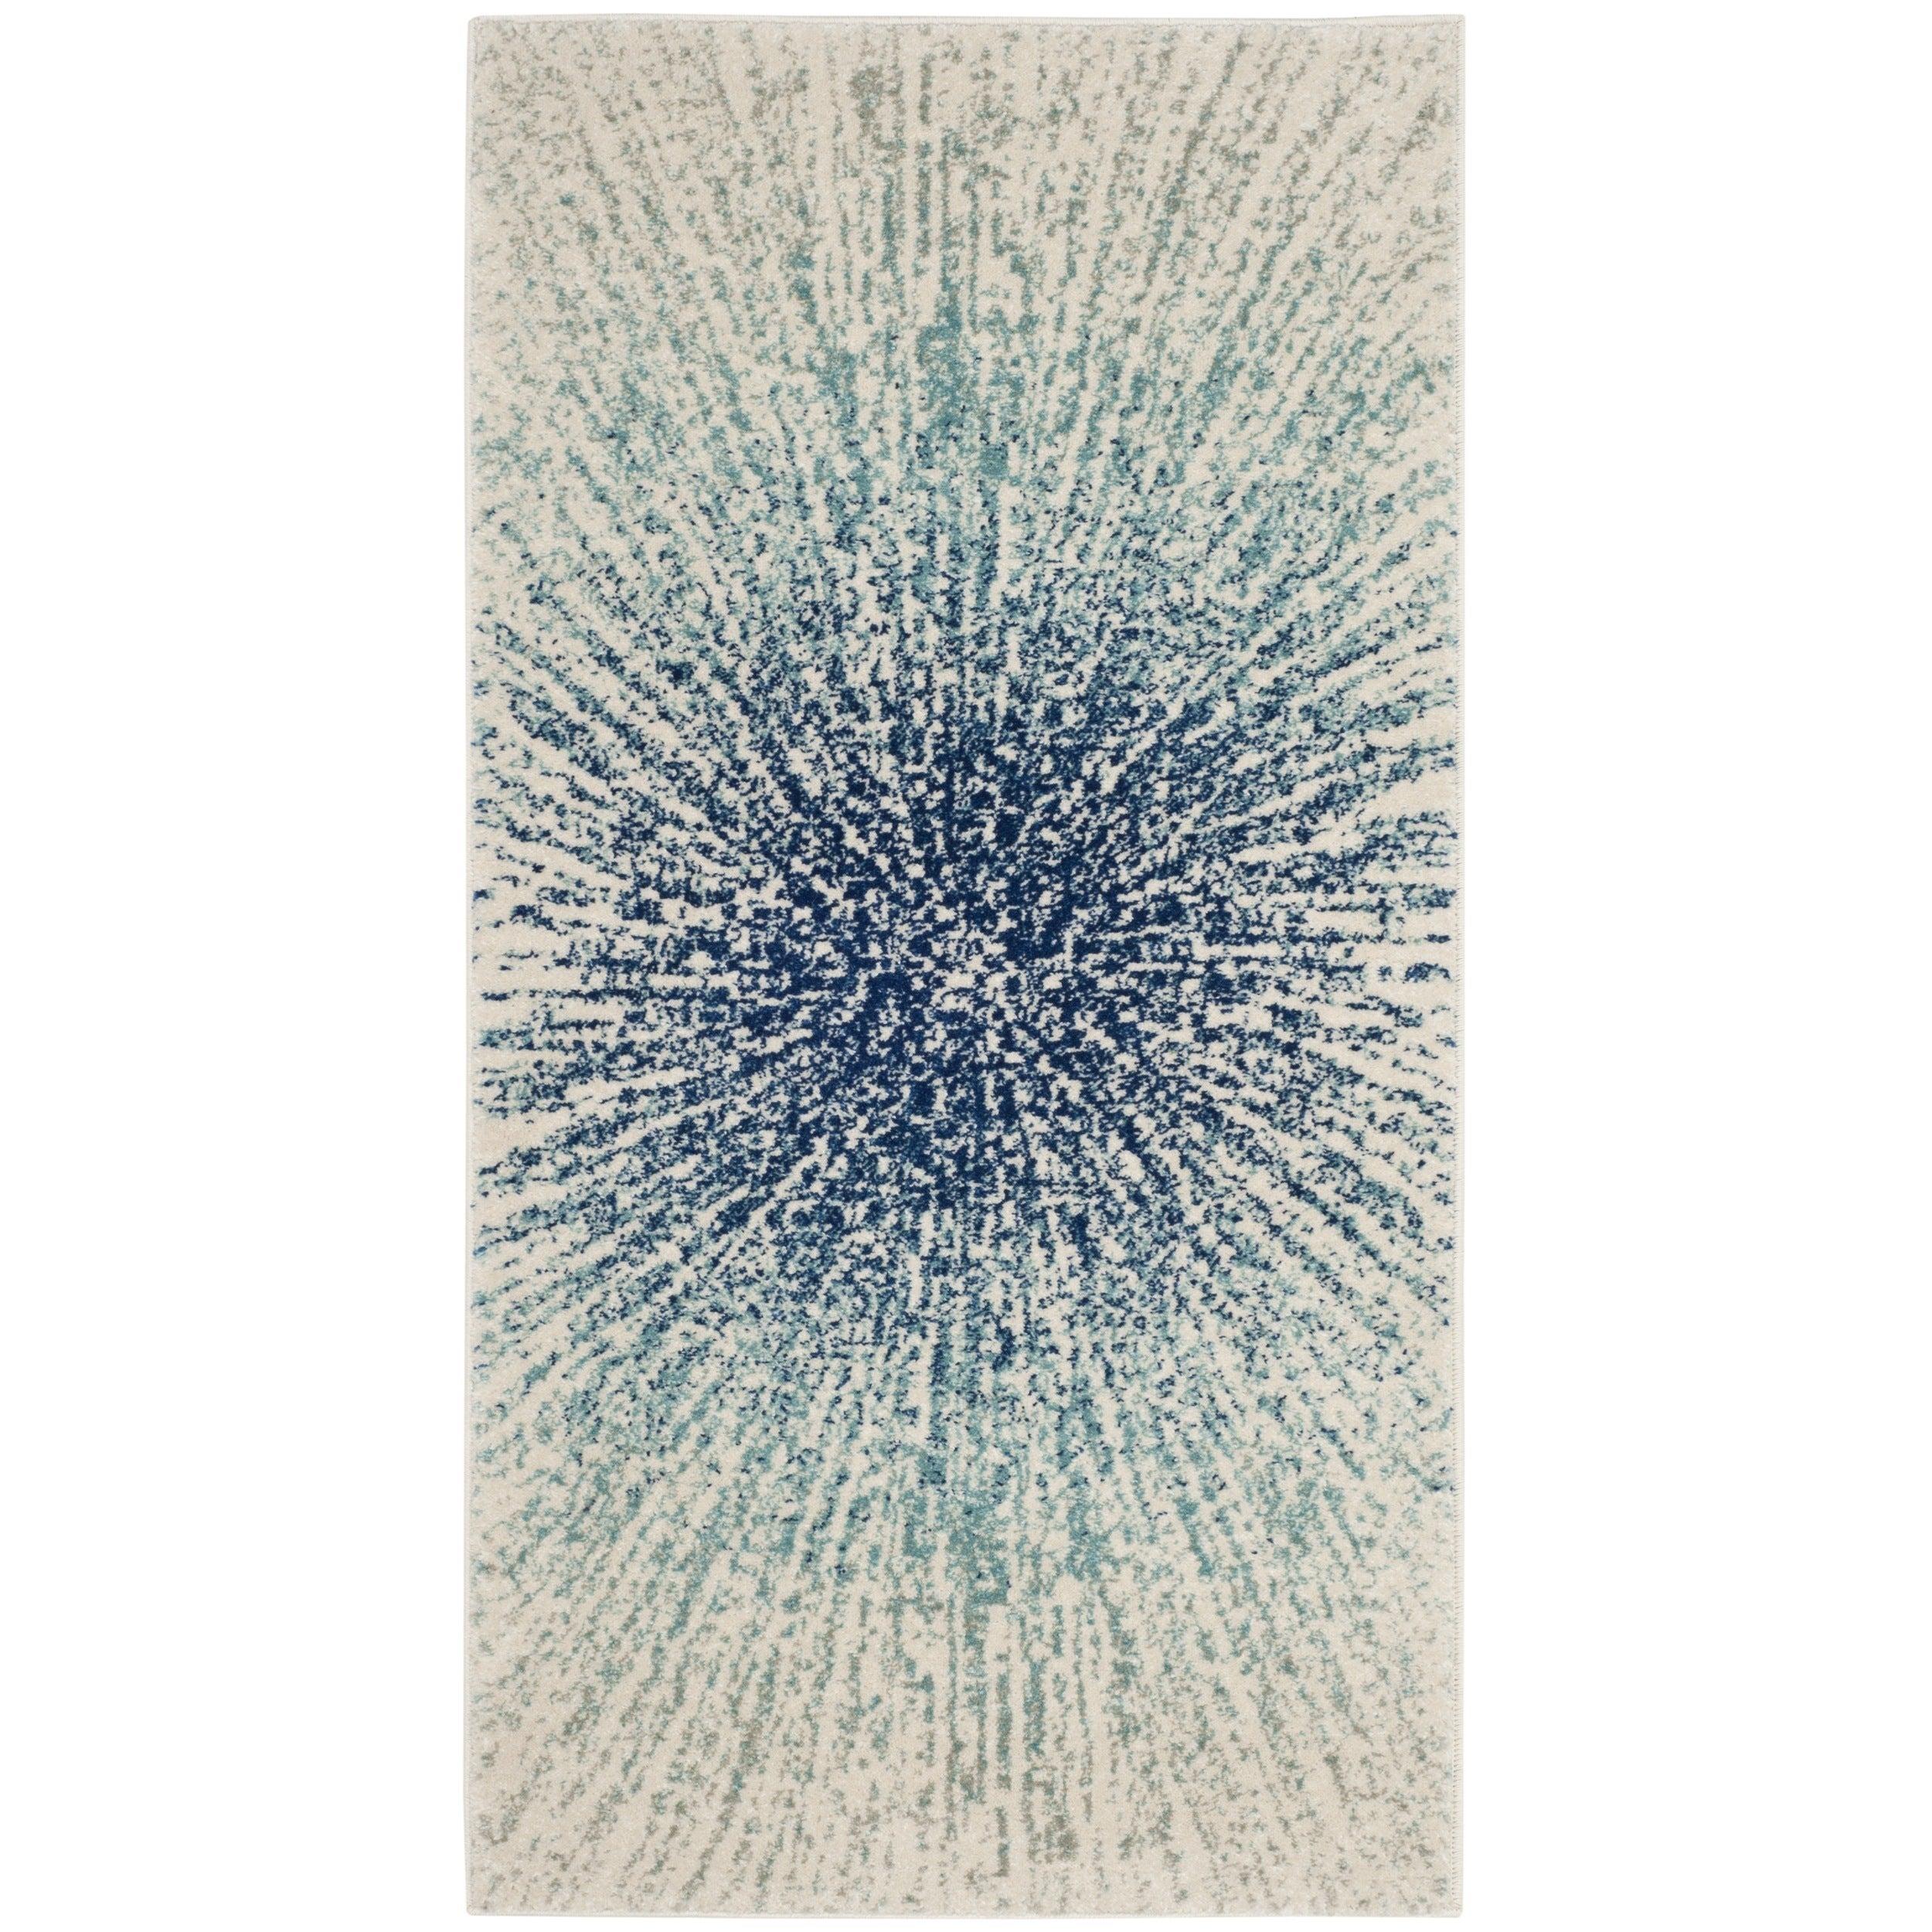 Safavieh Evoke Nova Abstract Burst Royal Blue Ivory Rug